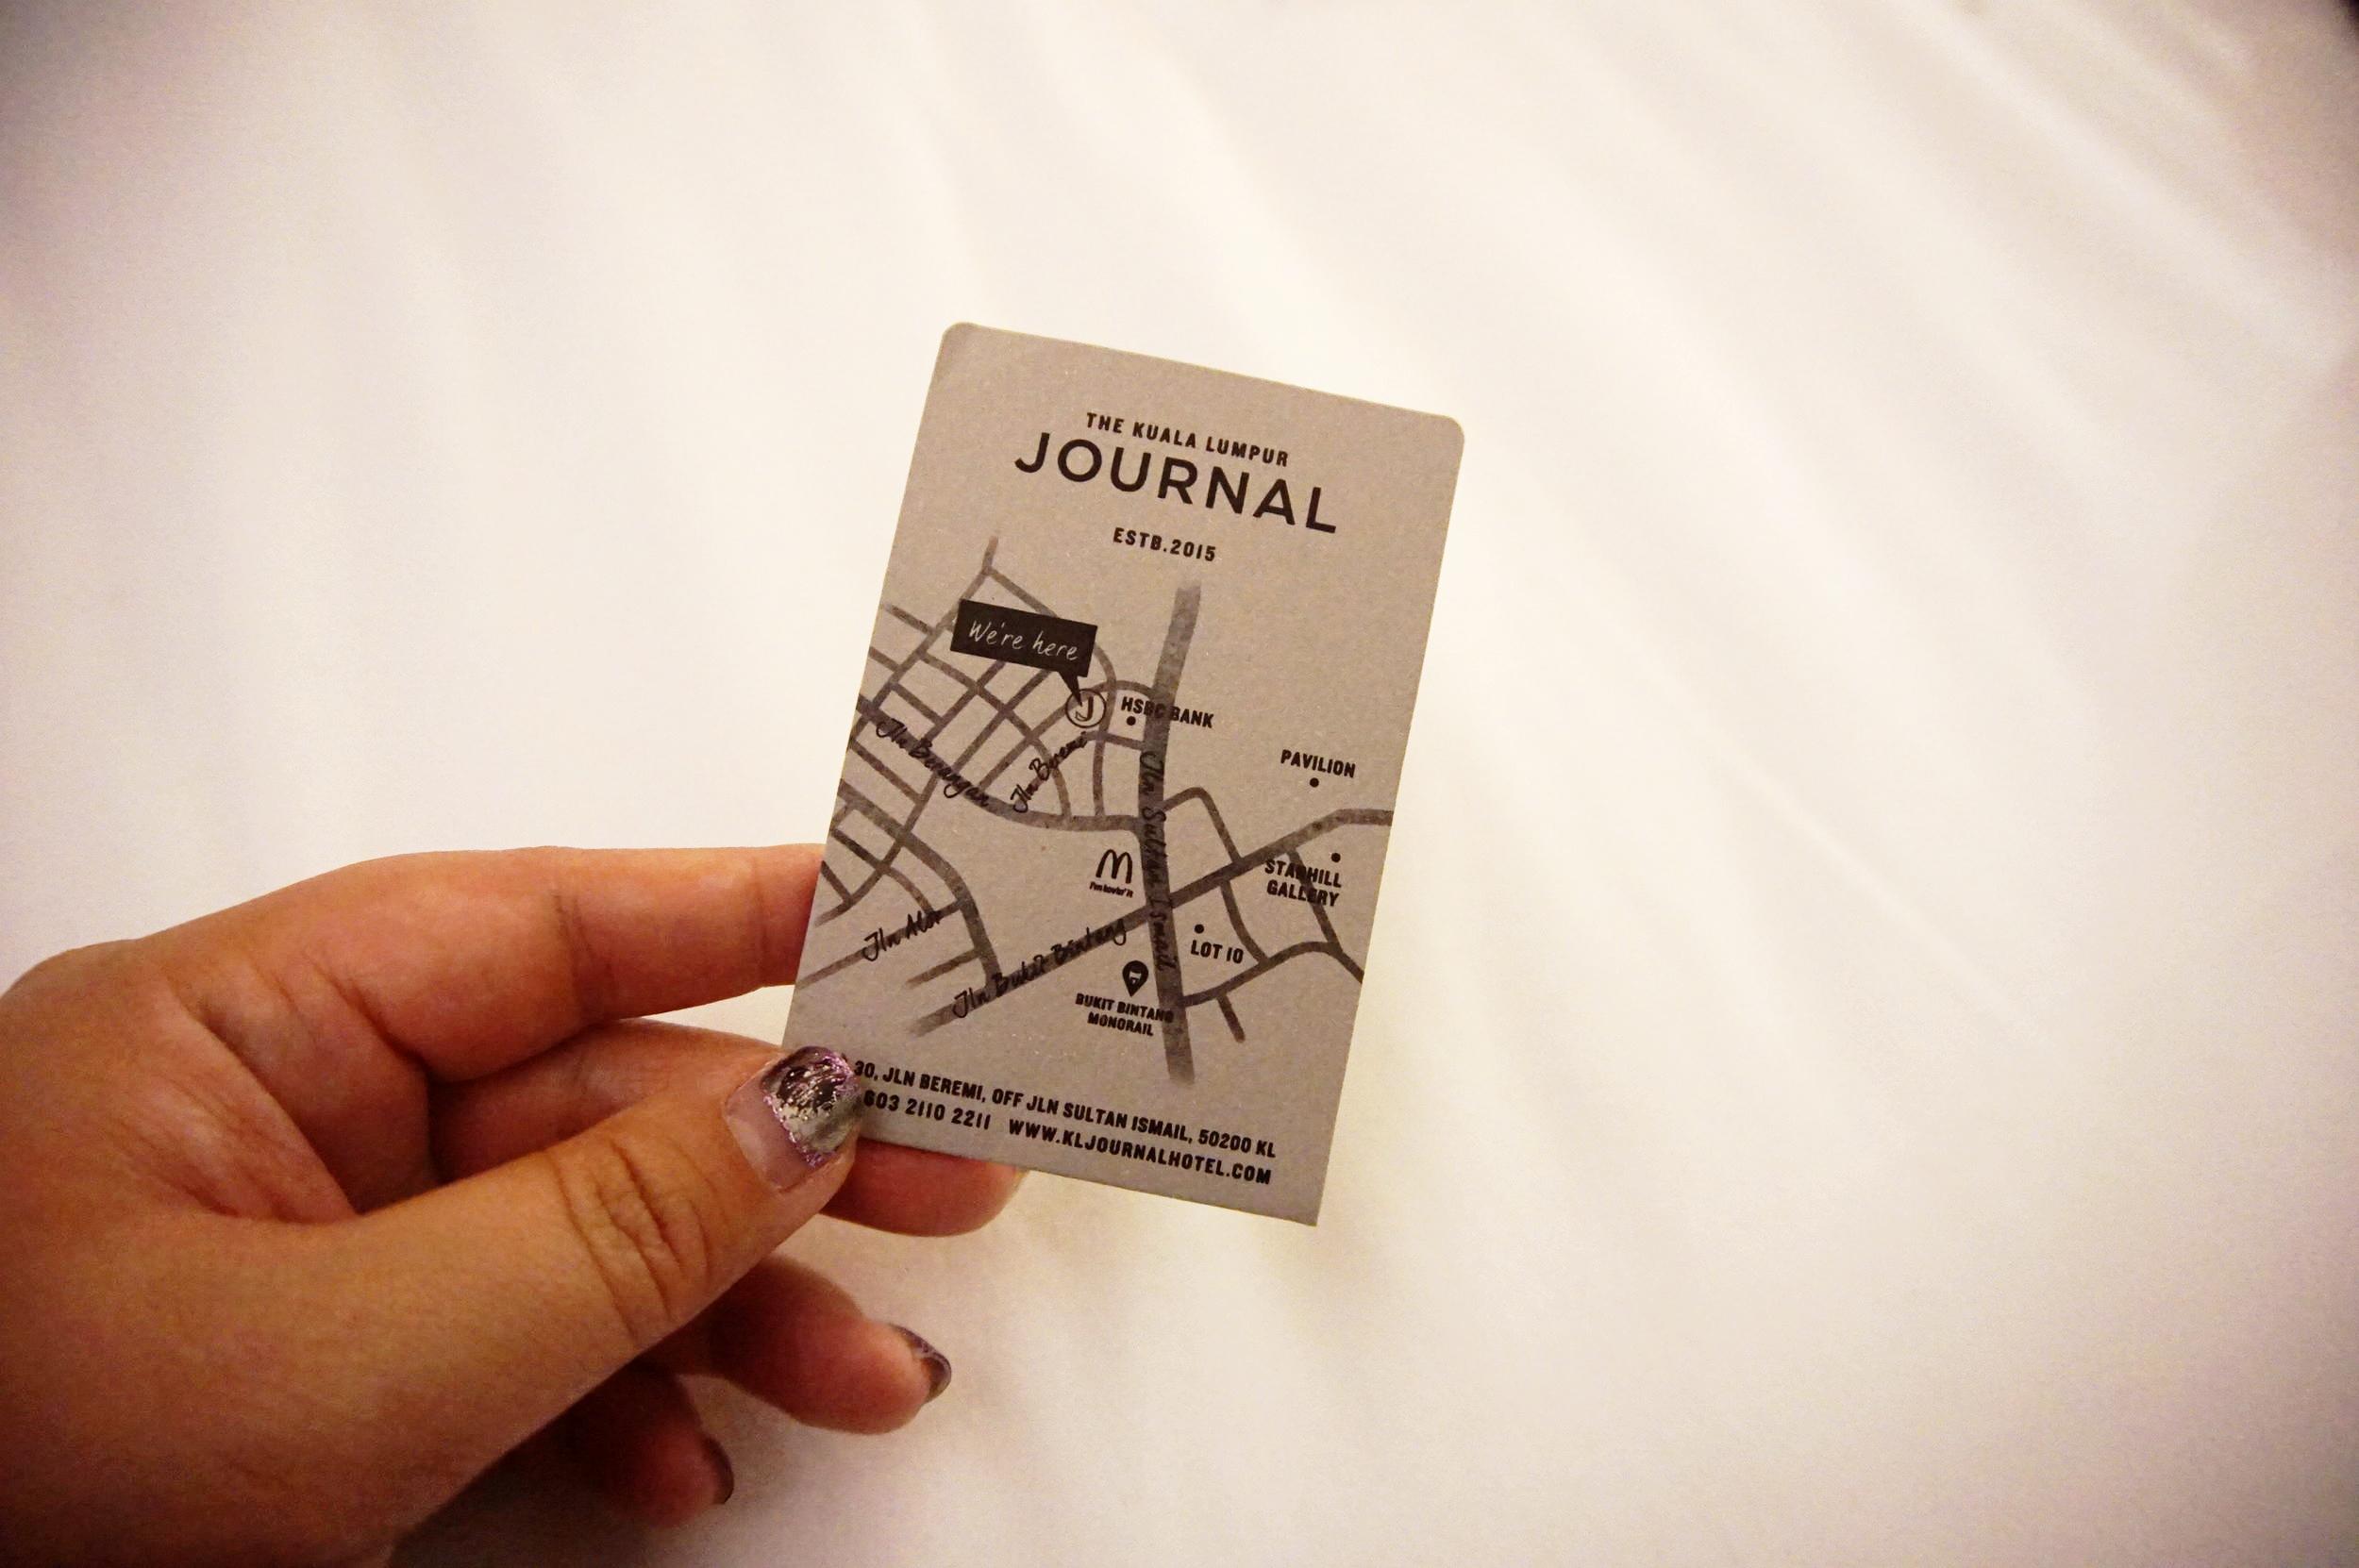 KL Journal Hotel